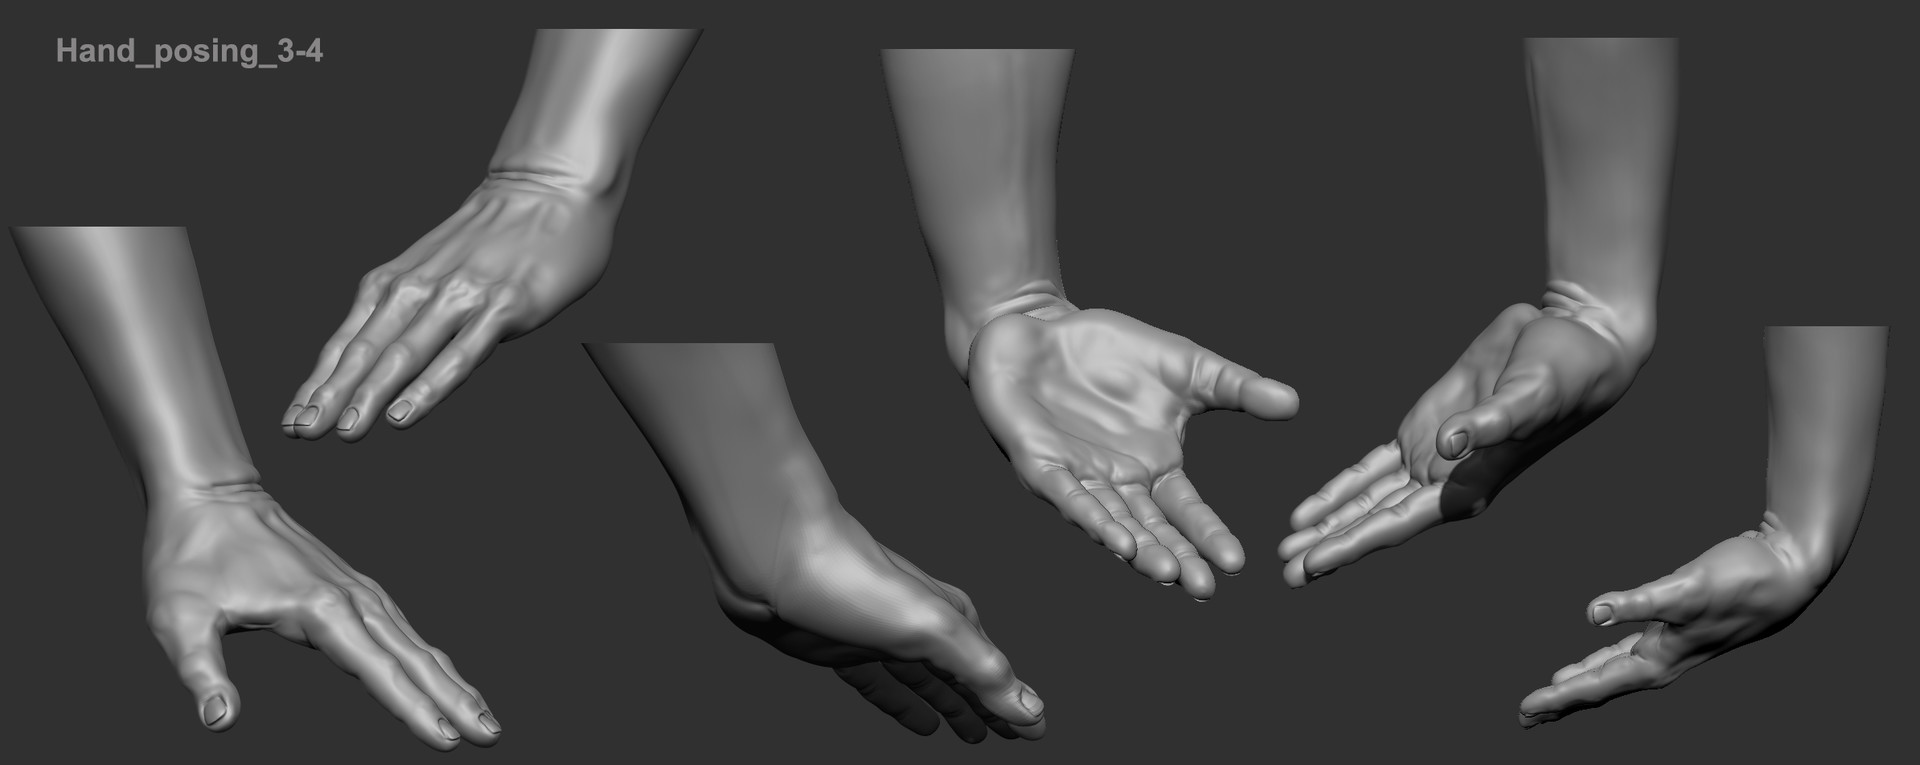 oscar loris human anatomy studies